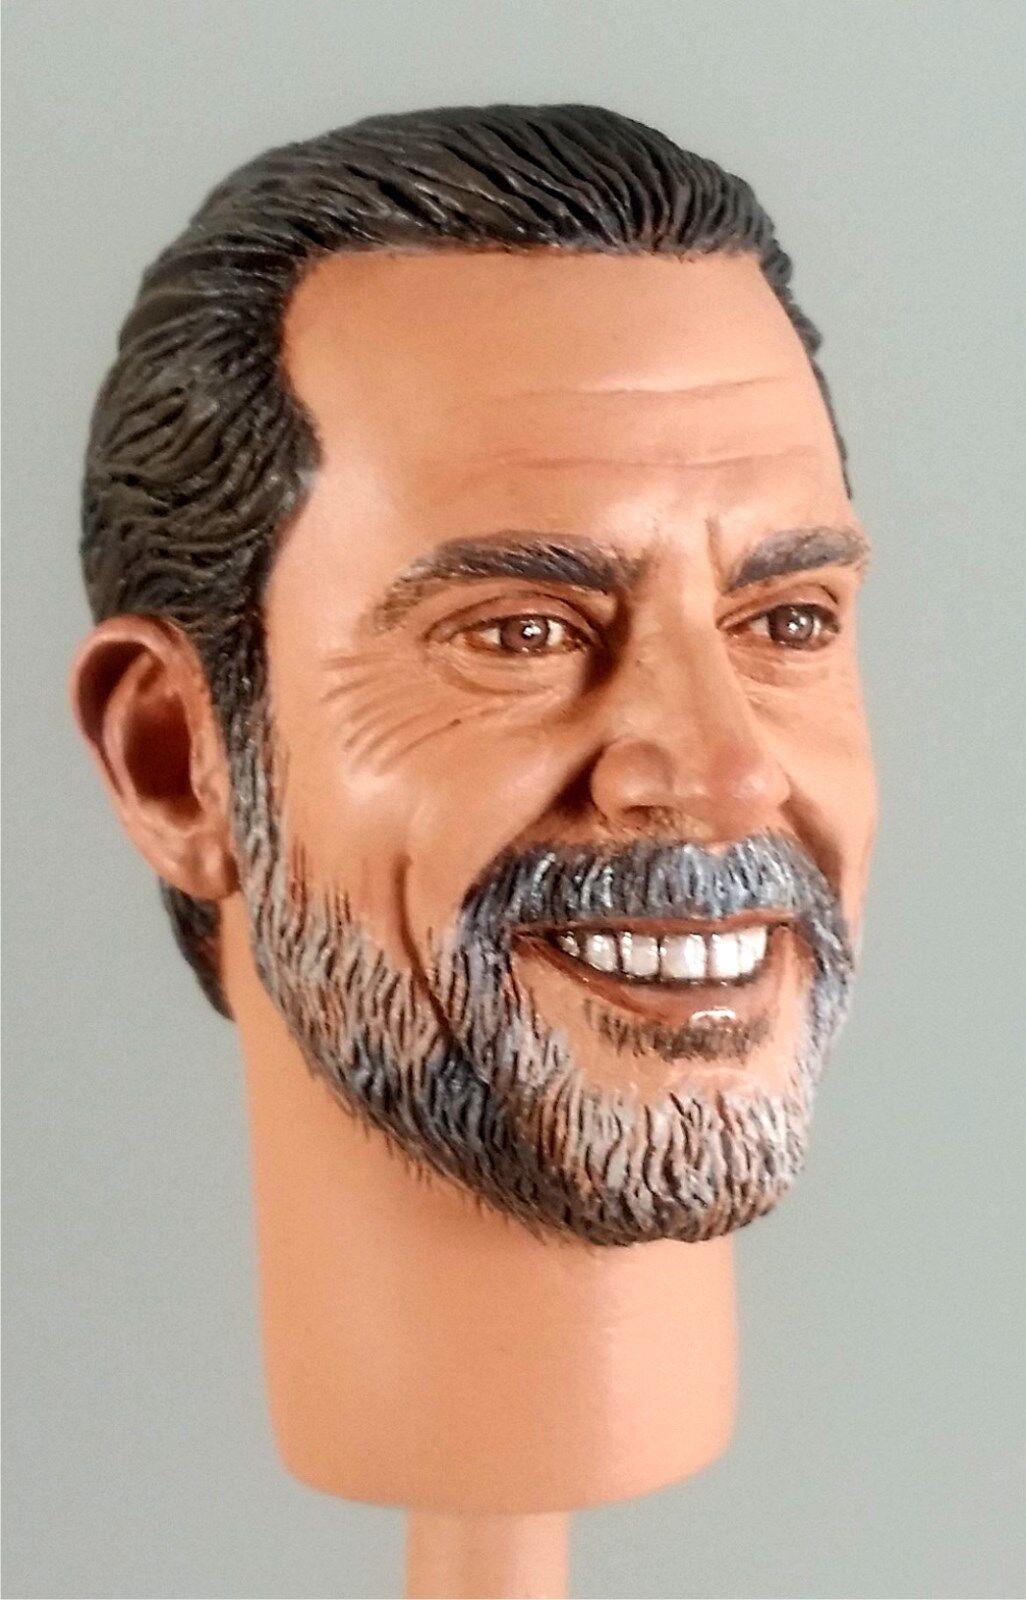 1:6 1:6 1:6 Custom Head of Jeffrey Dean Morgan as Negan Version 4 from The Walking Dead 6a4a01